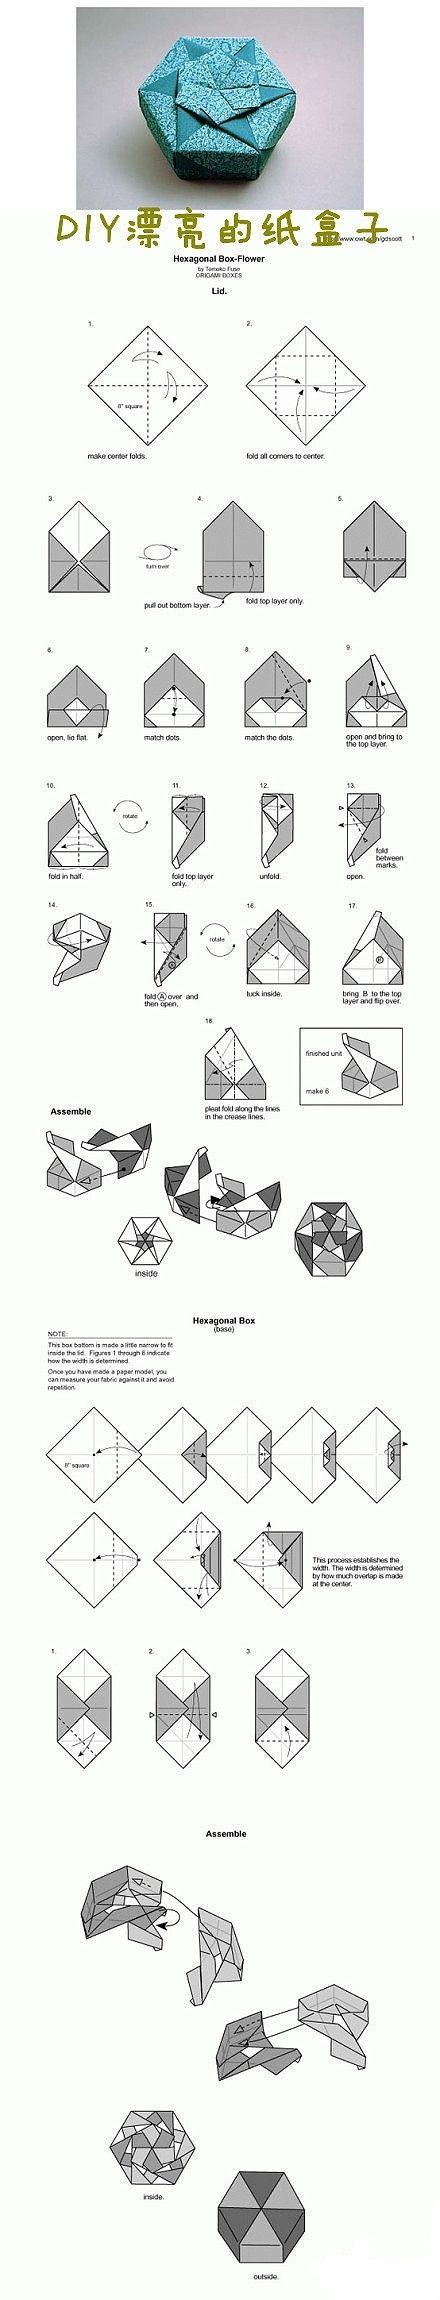 Origami Hexagon Flower Box: